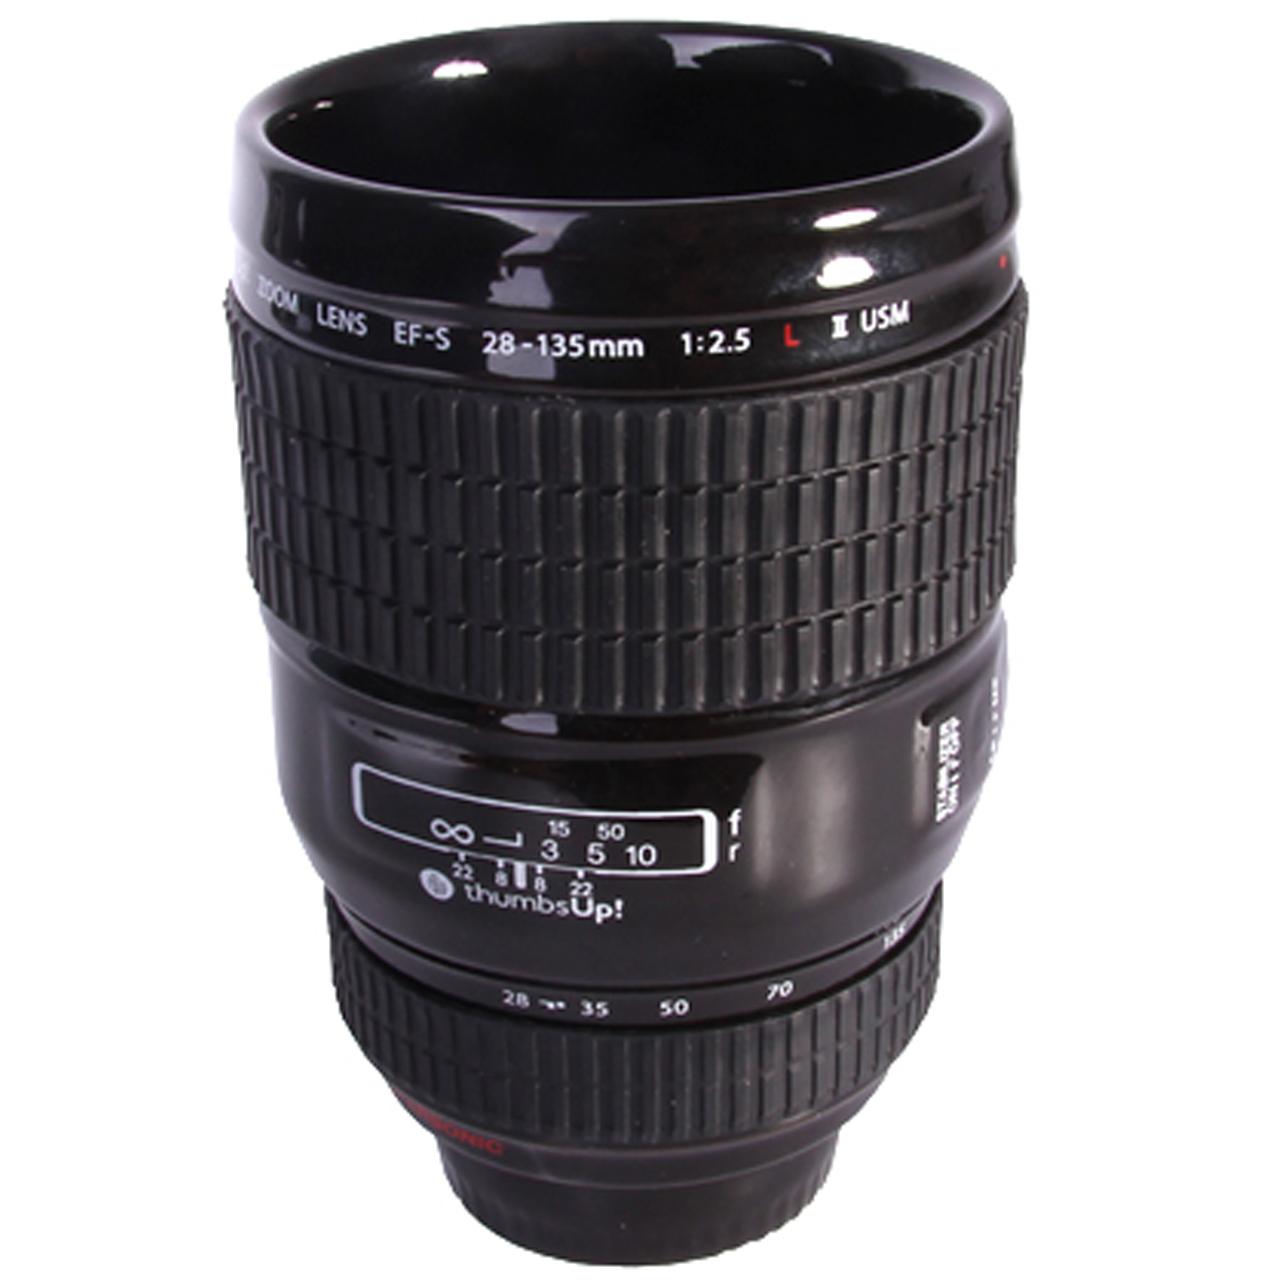 عکس ماگ تامز آپ مدل Camera Lens